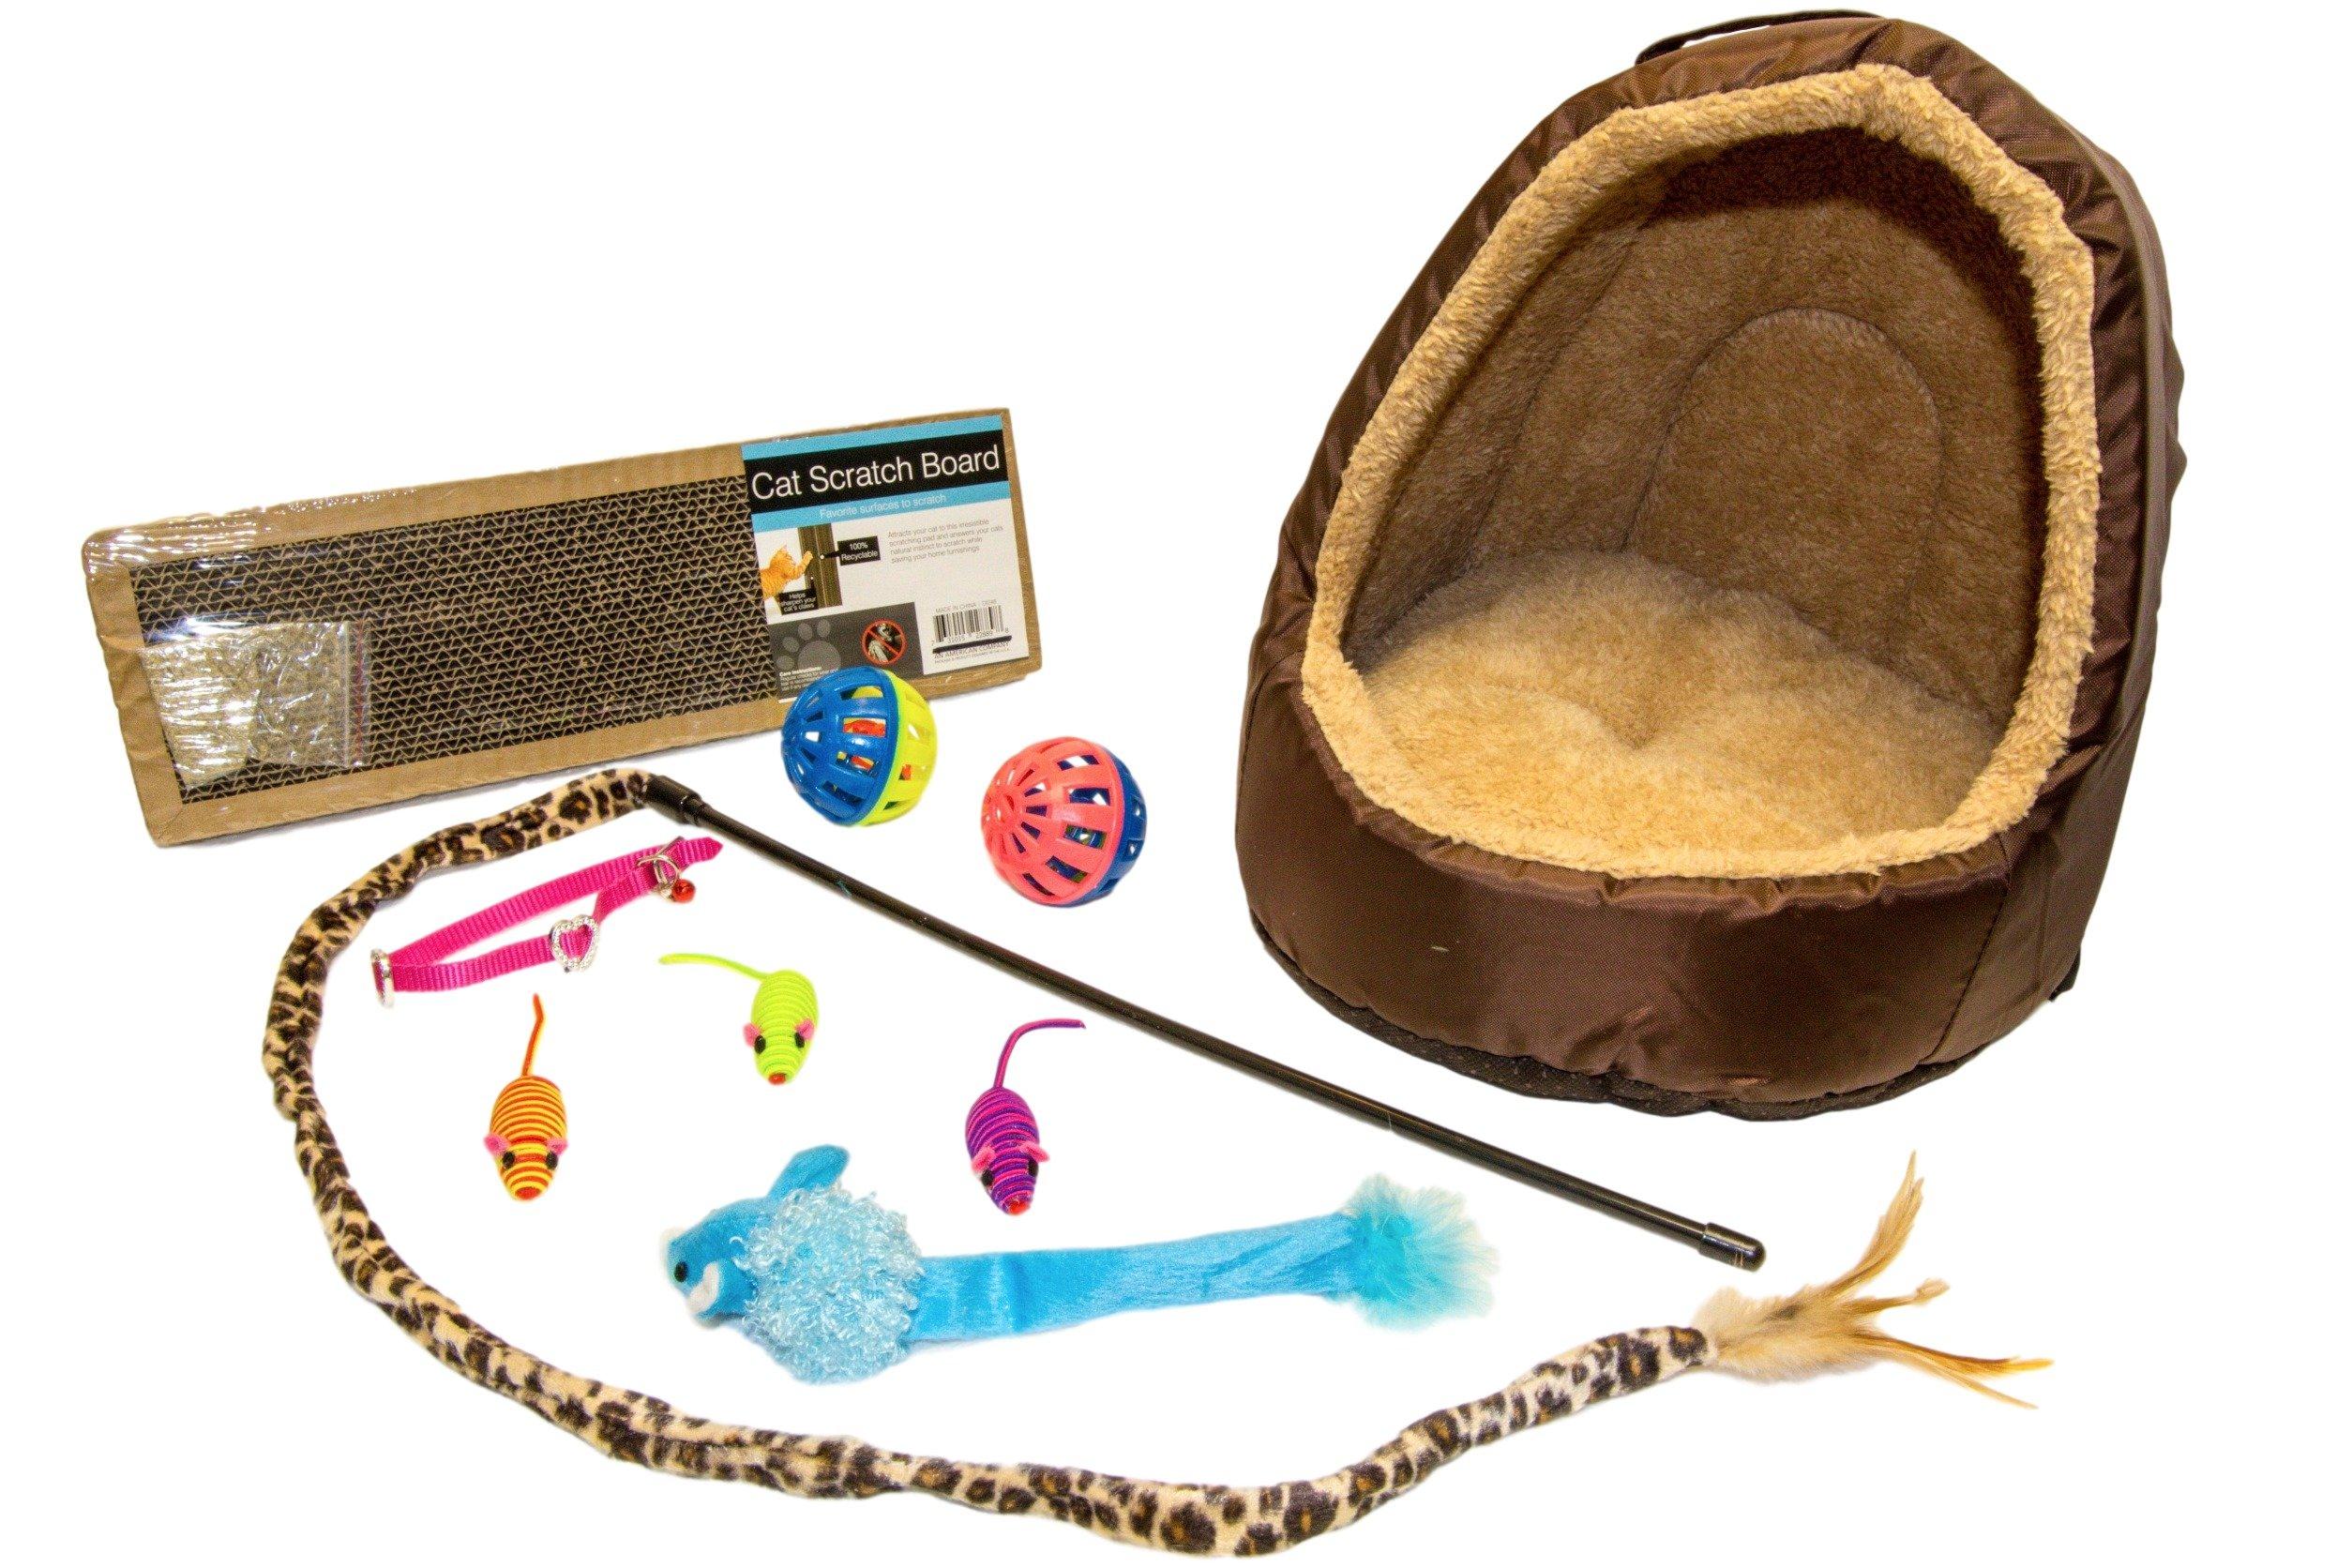 EMG Pet Emporium Pet House & Toy Bundle for Cats | Leopard Teaser | Blue Longtail Critter | 2 - Jumbo Play Balls | 3 - Rattle Mice | 5'' x 15'' Scratcher Pad | Collar | All Cats